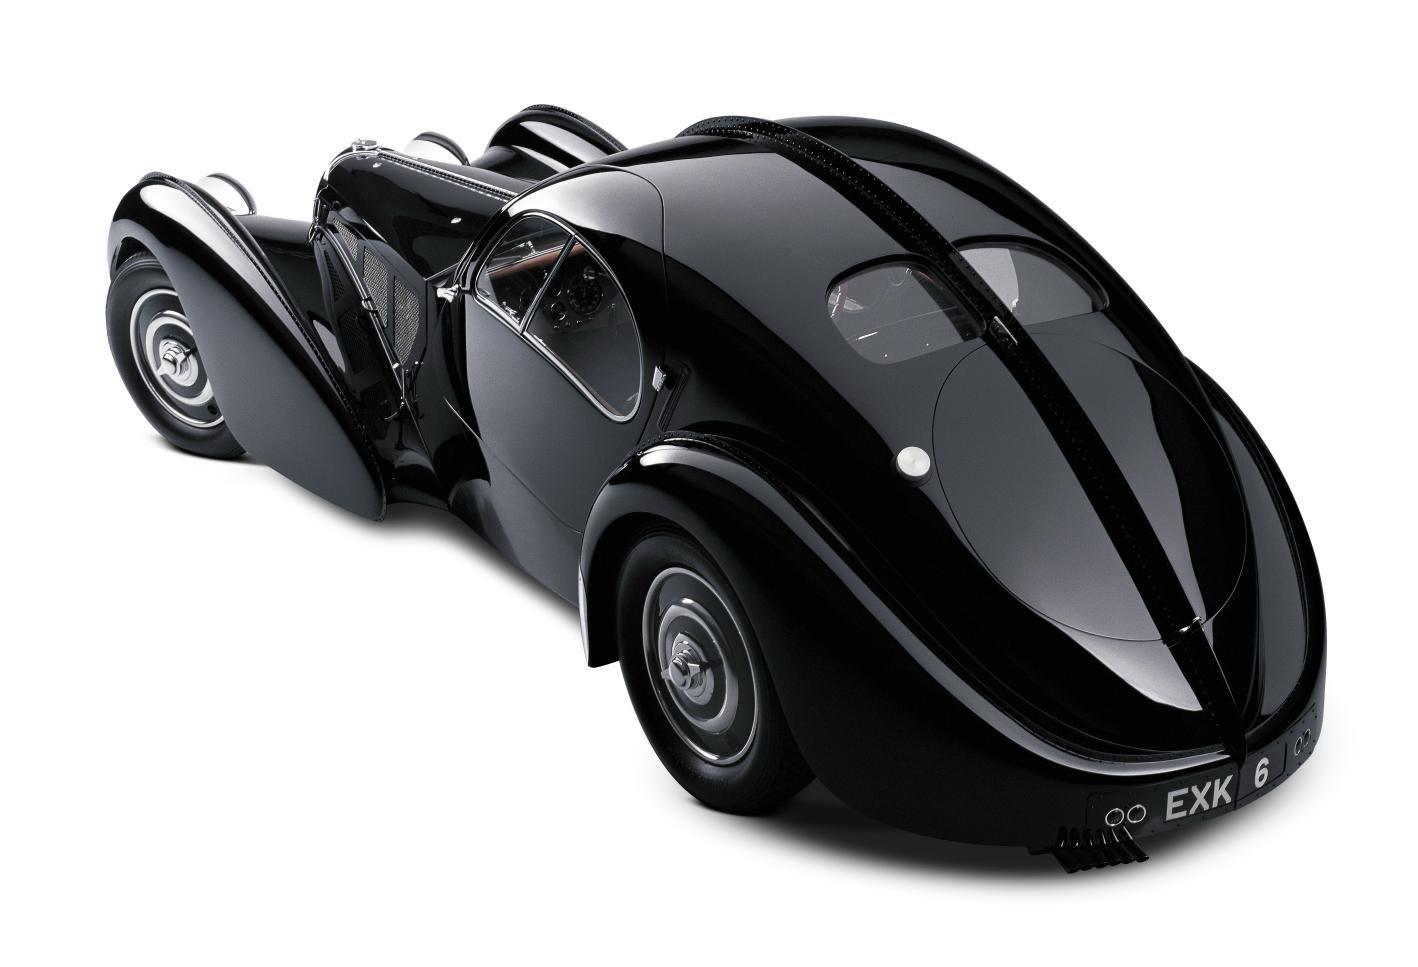 Style Sculpture 1938 Bugatti 57 Sc Atlantic Coupe Ralph Lauren S Car Collection Bugatti Type 57 Expensive Cars Beautiful Cars